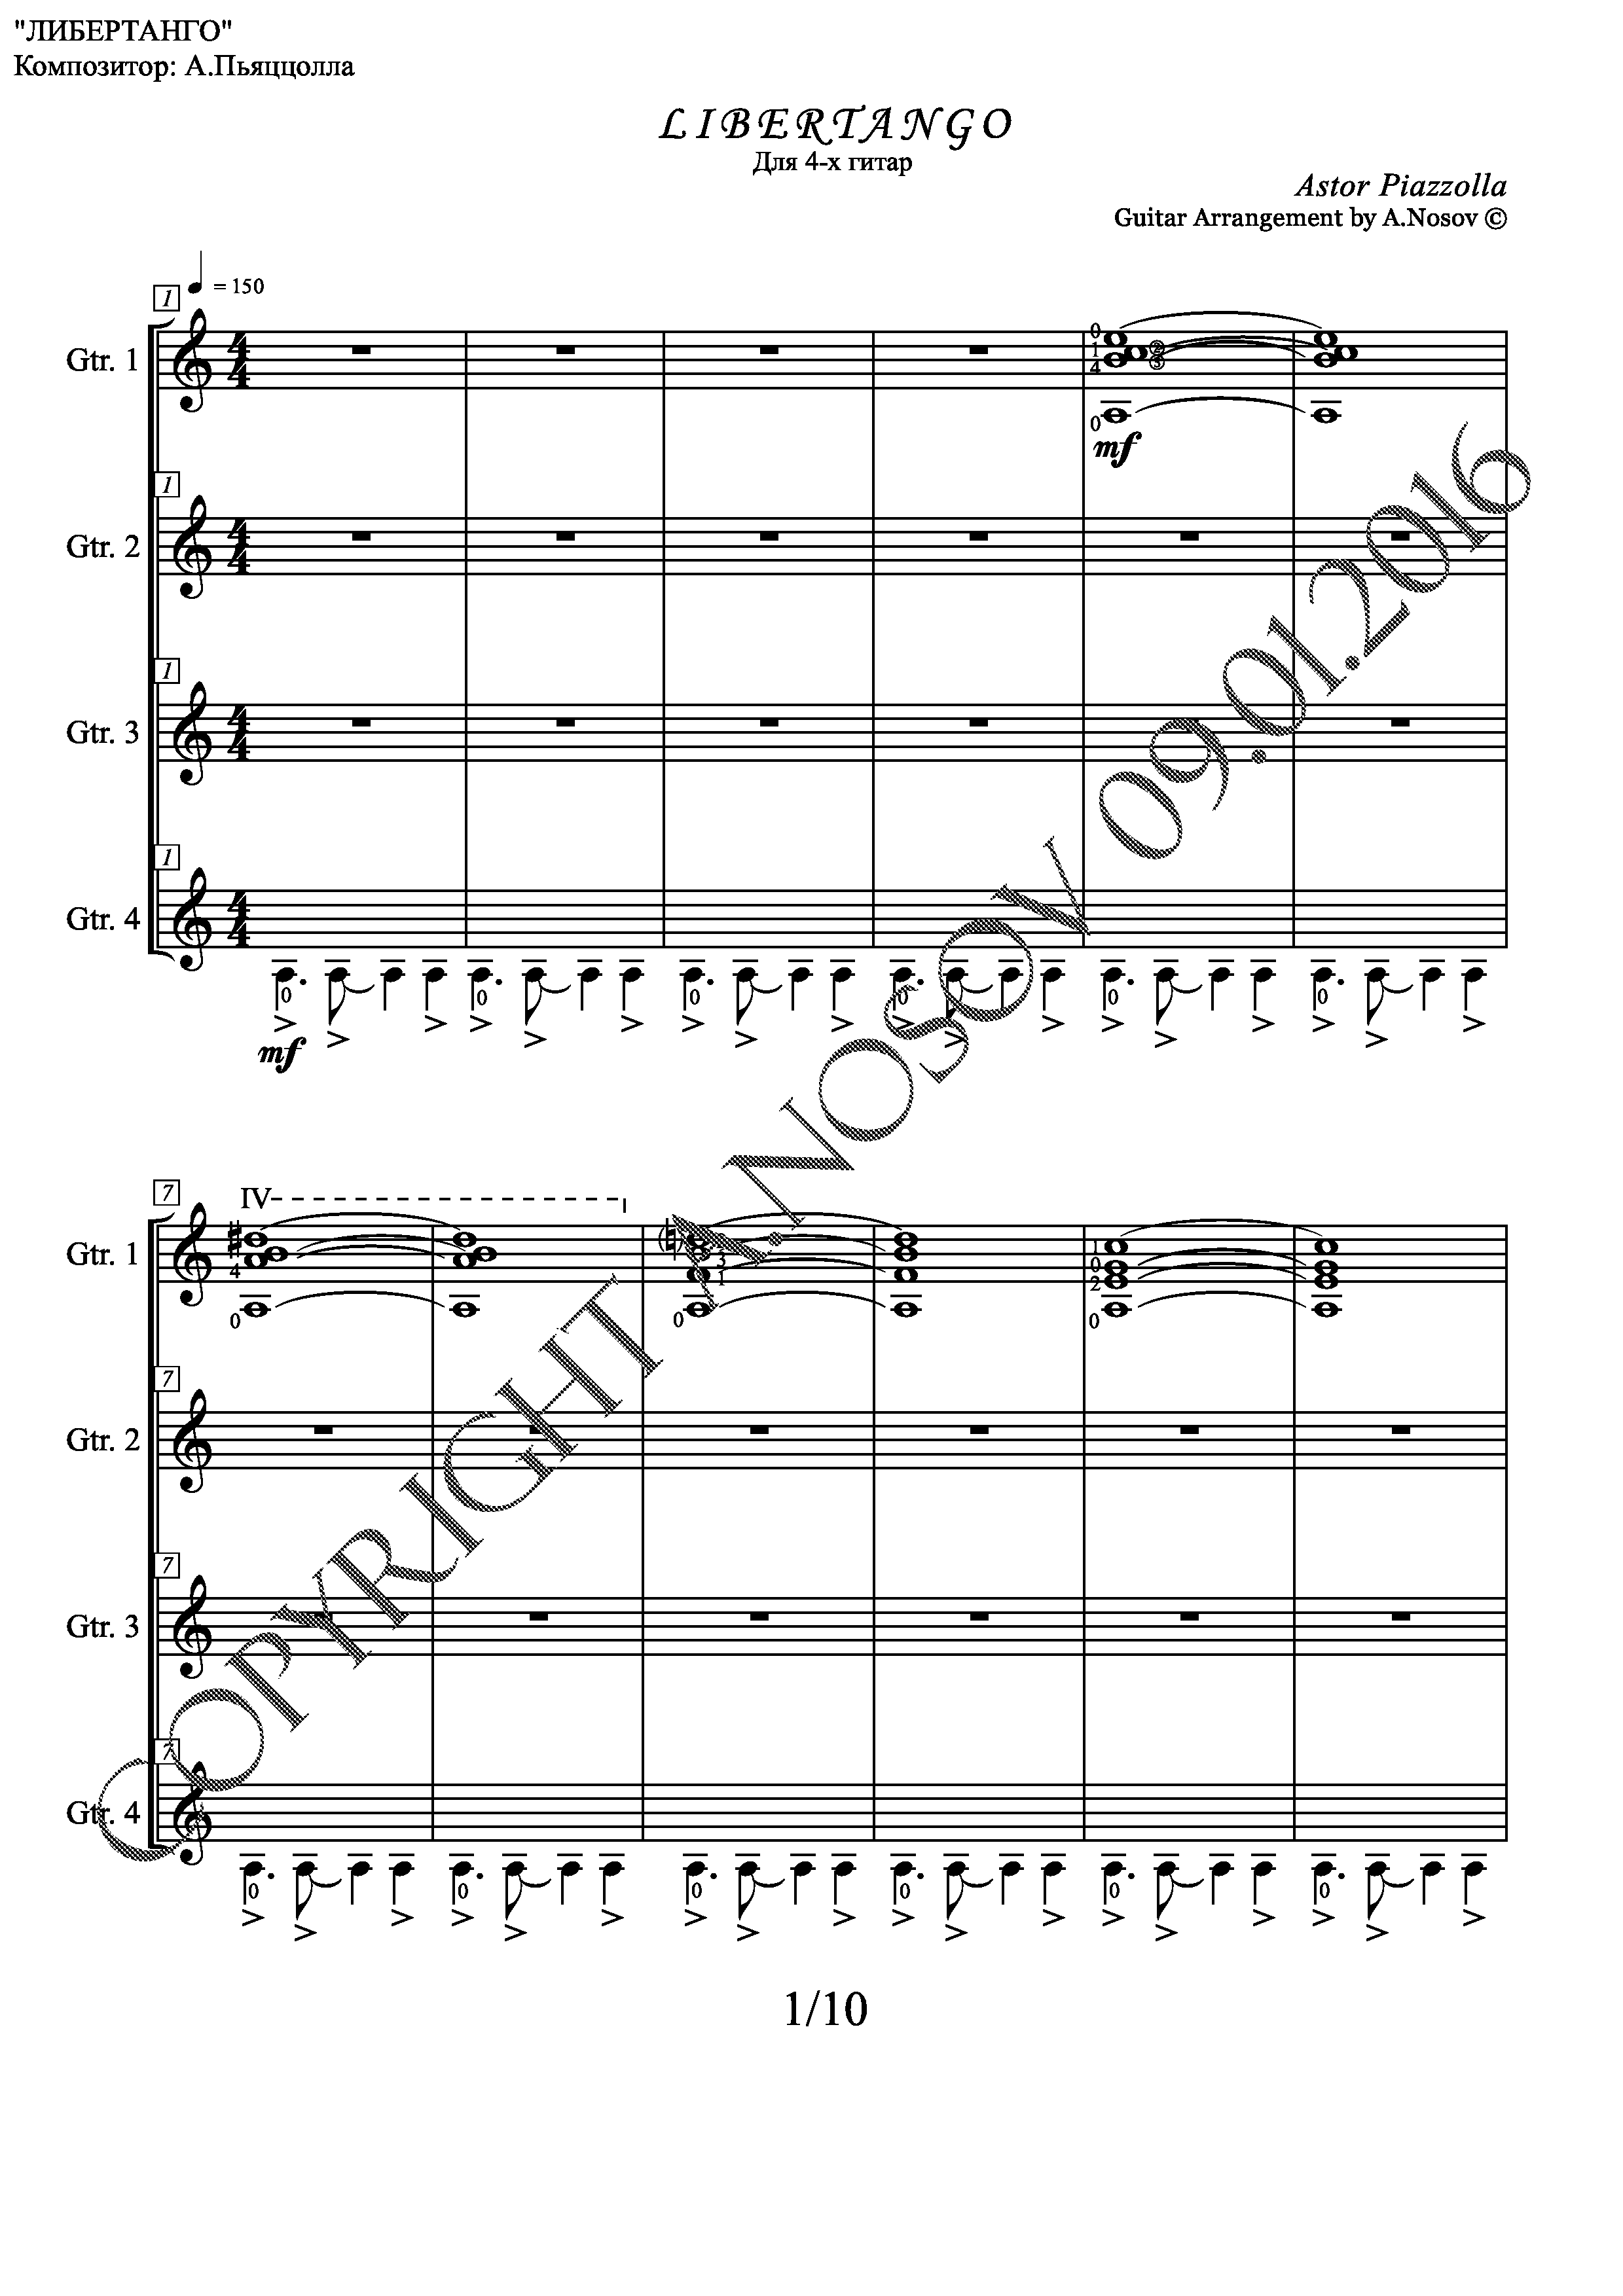 Libertango (Sheet music for 4 guitars)